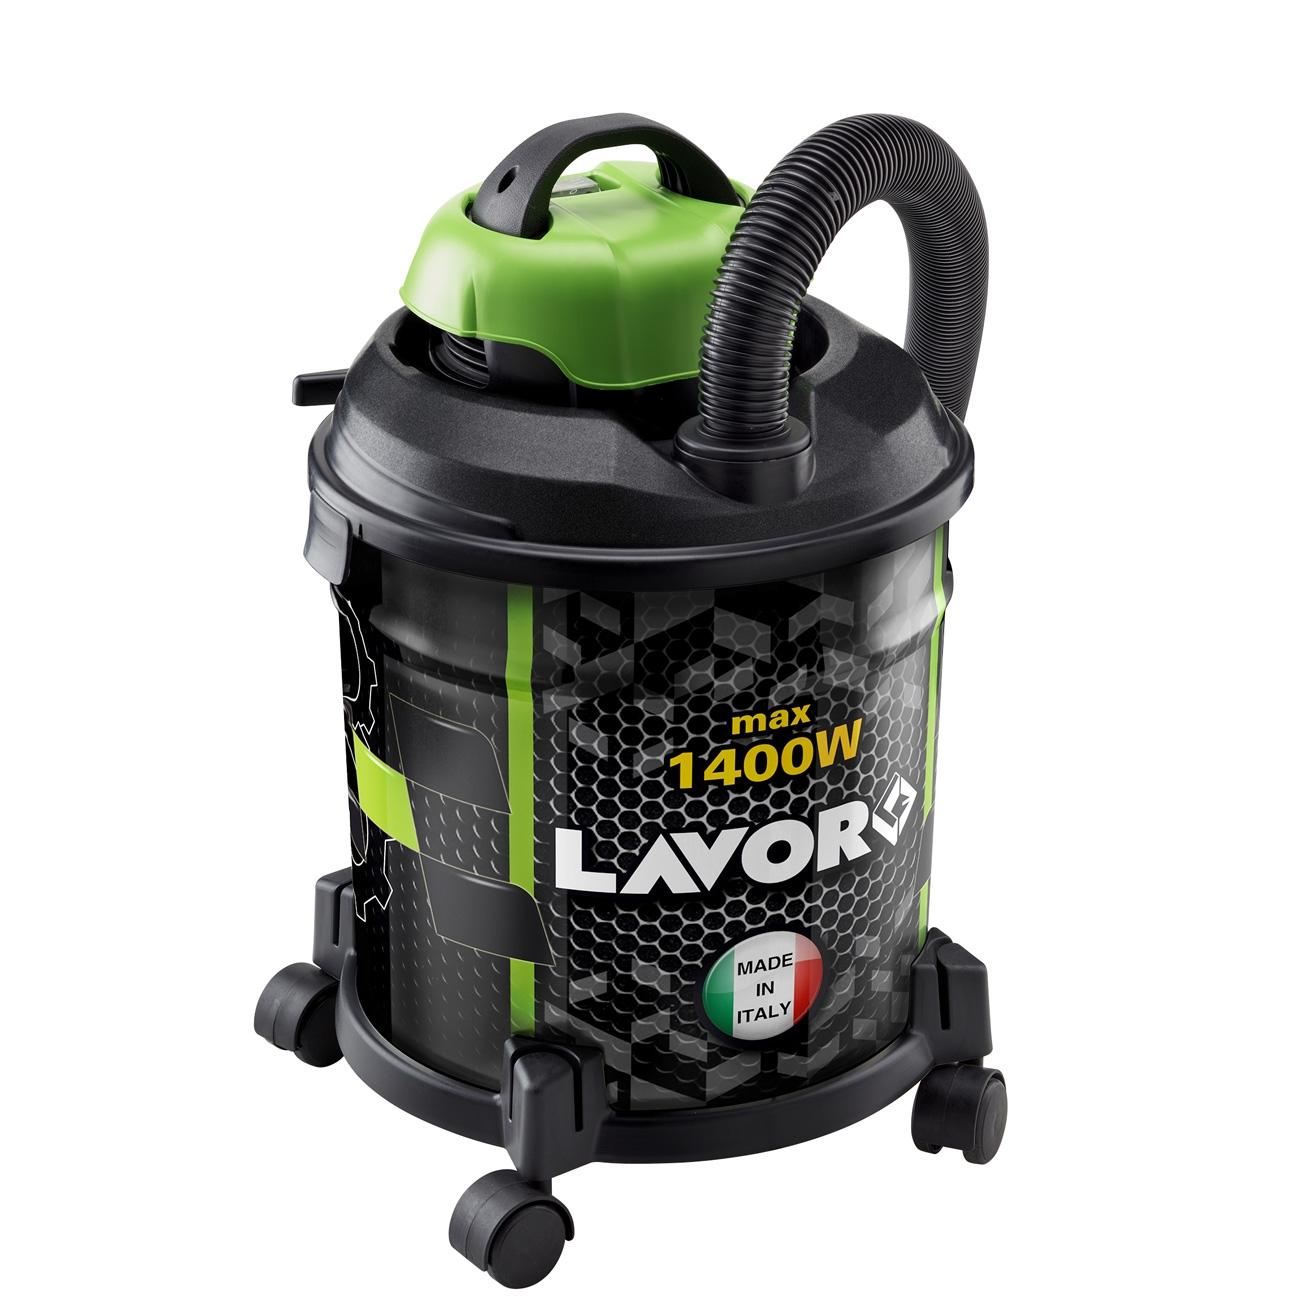 Lavor Joker 1400 S aspirateur